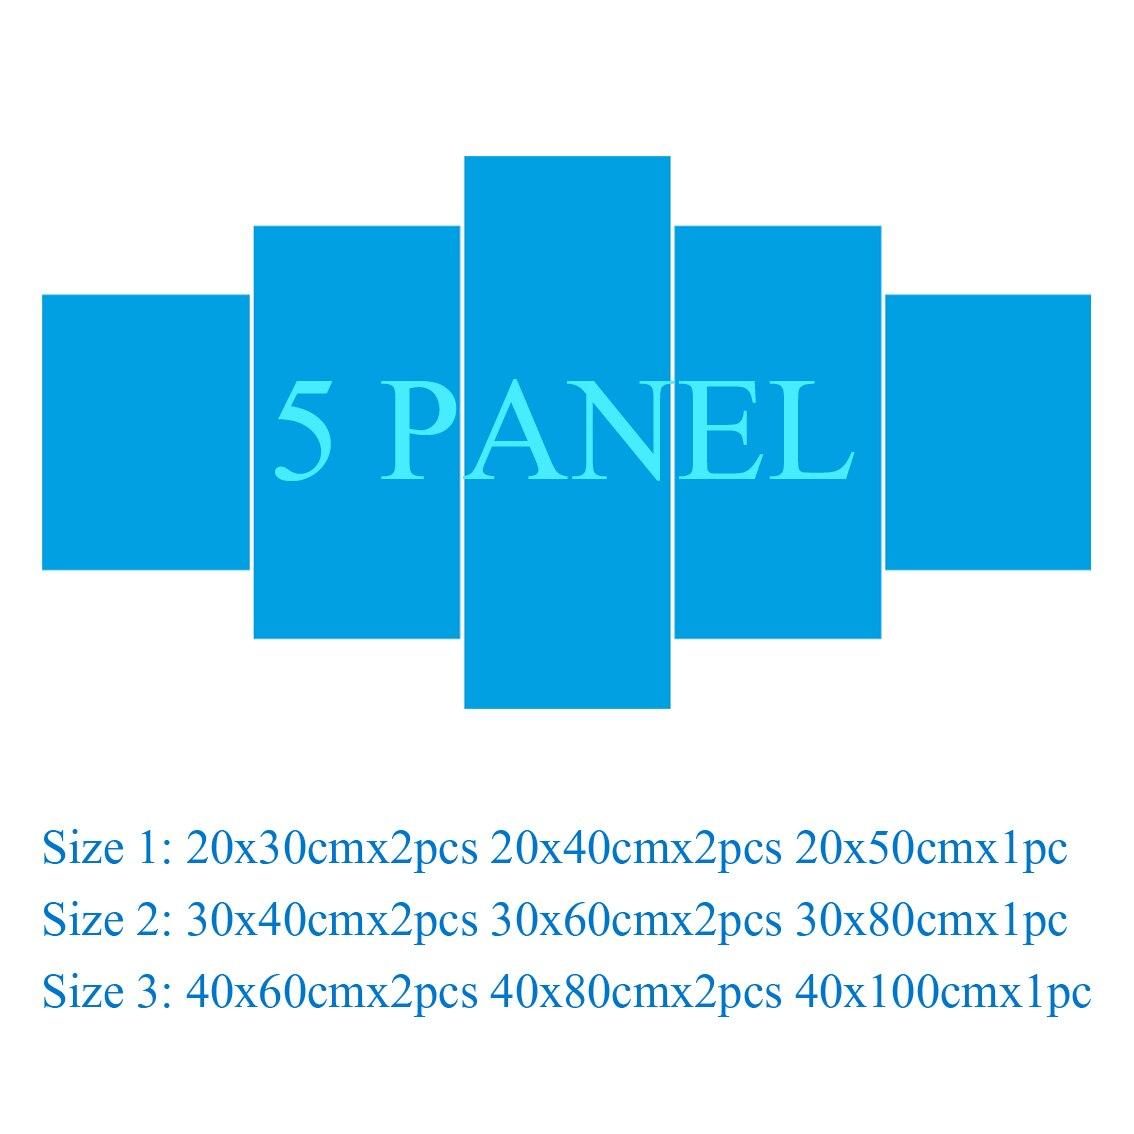 5 Шт. Babymetal Холст Картины Wall Art Pictures Отпечатки на Холсте Home Decor Стены Плакат  Лучший!